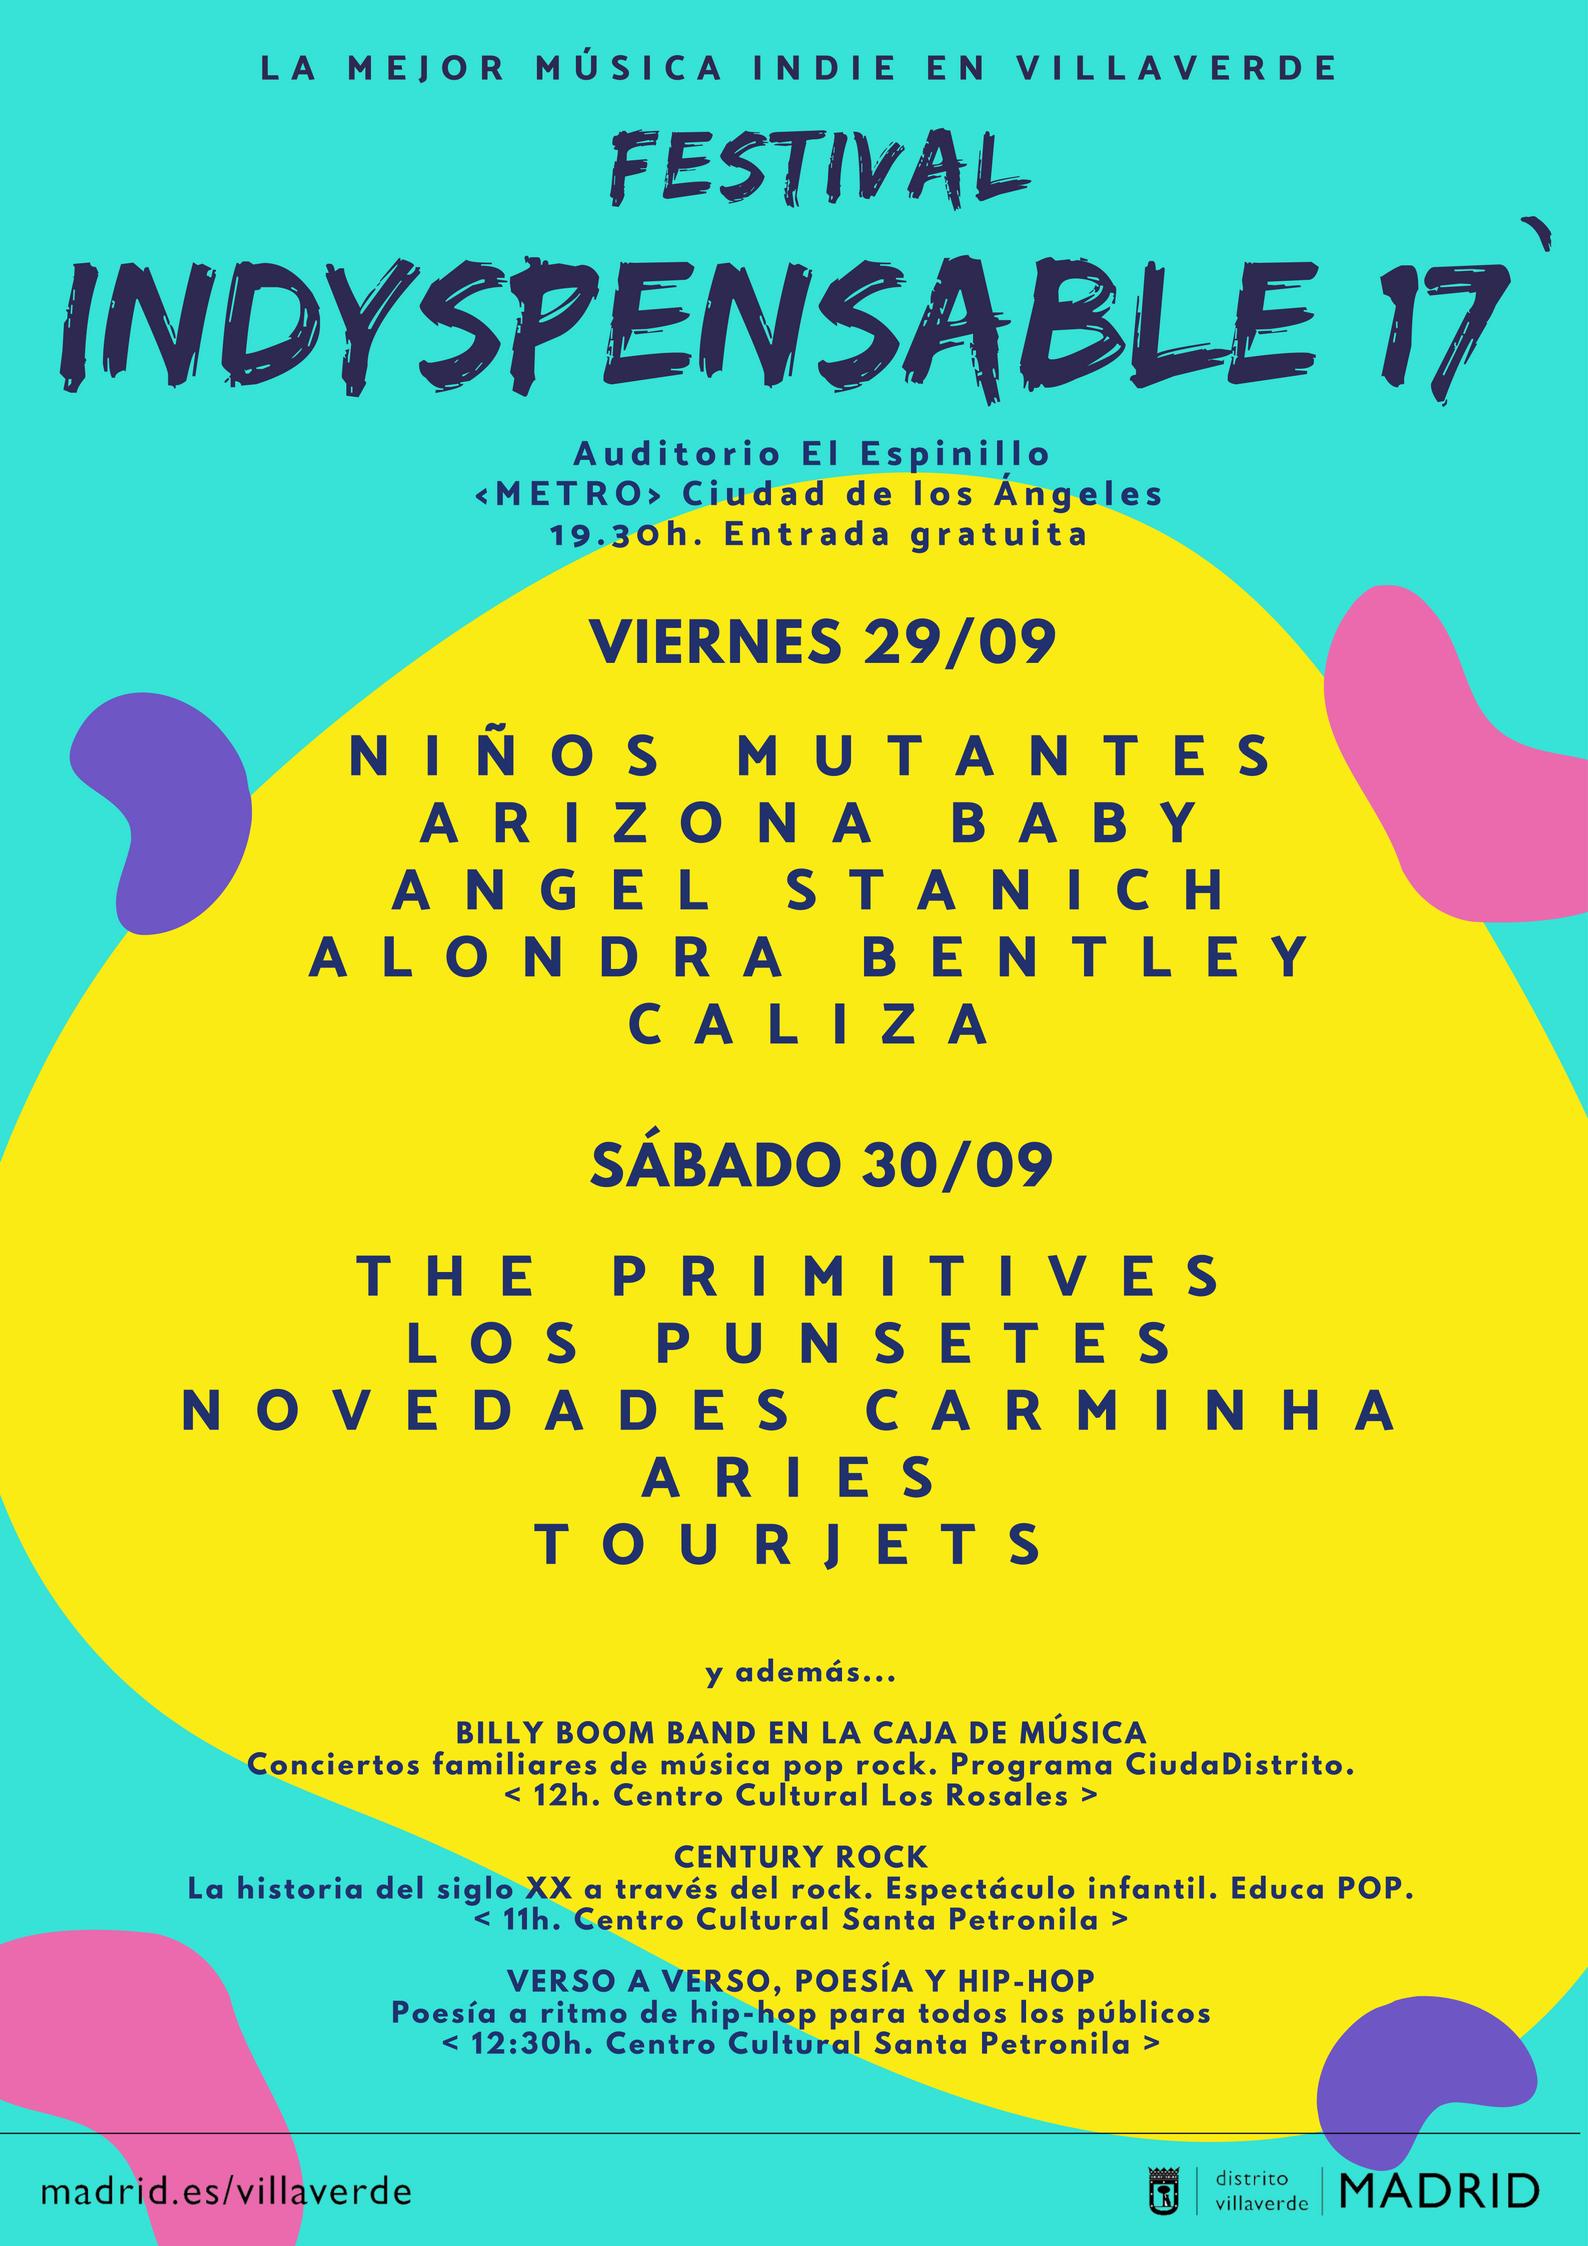 Indyspensable 2017